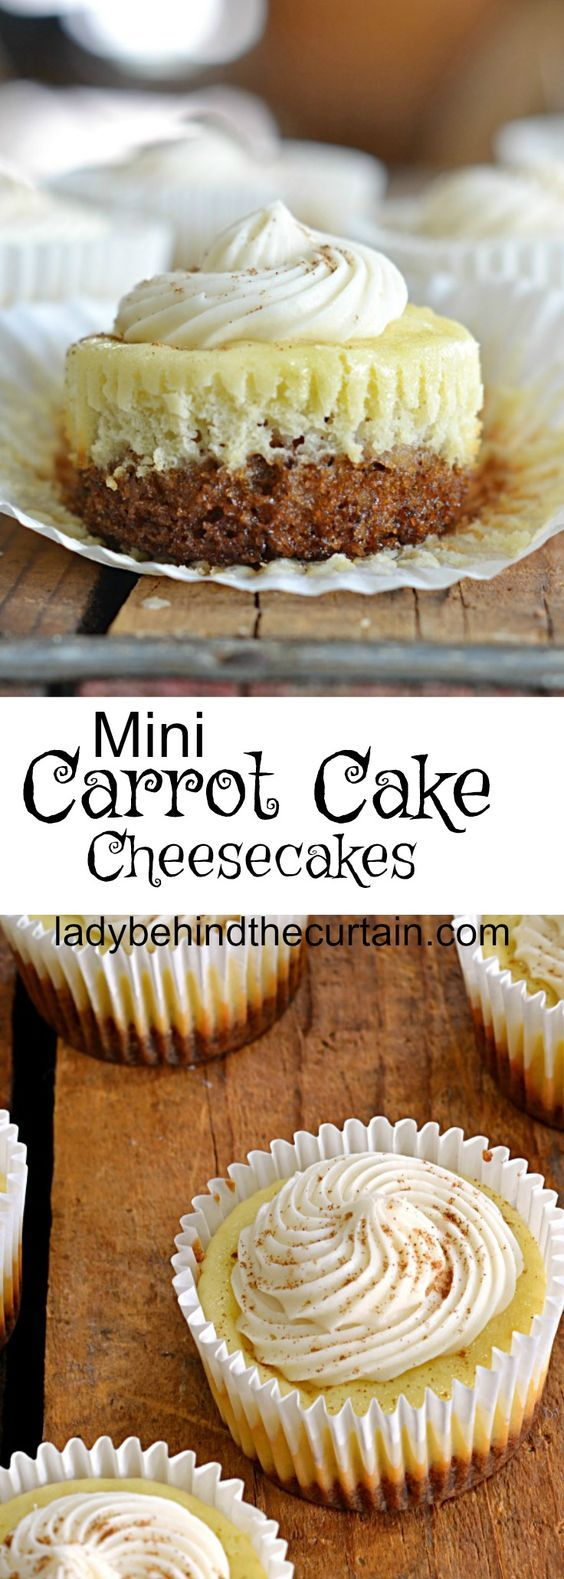 Mini Carrot Cake Cheesecakes 258 best wedding